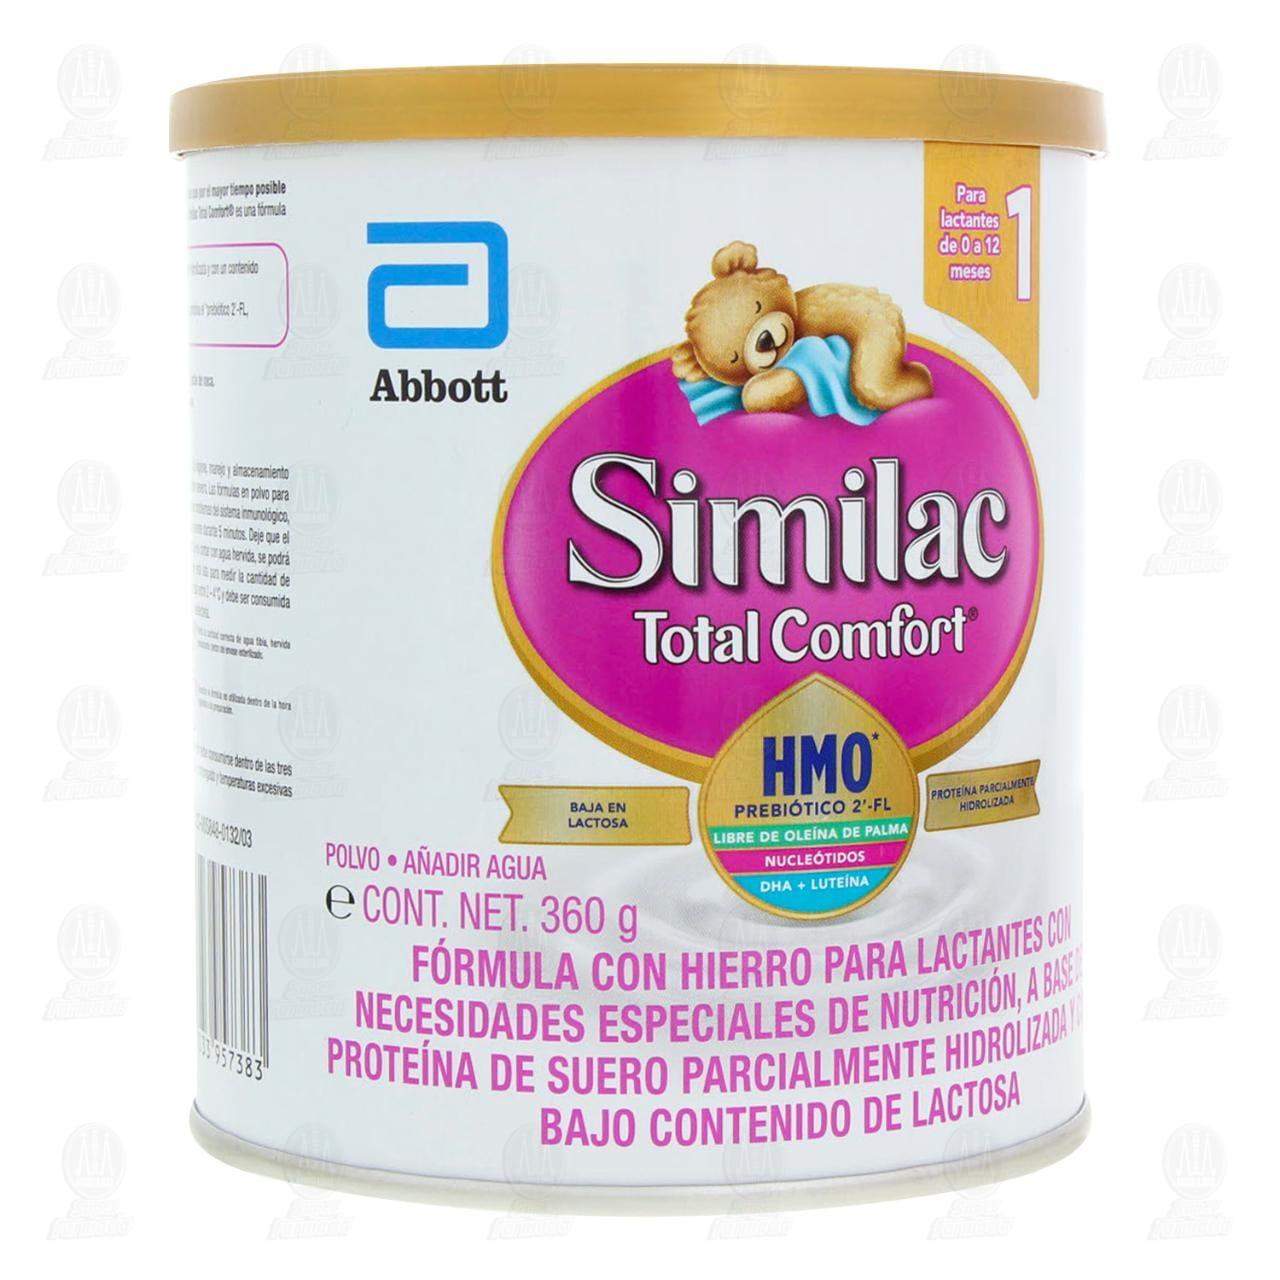 Comprar Fórmula Infantil Similac Total Comfort 1 en Polvo (Edad 0-12 Meses), 360 gr. en Farmacias Guadalajara